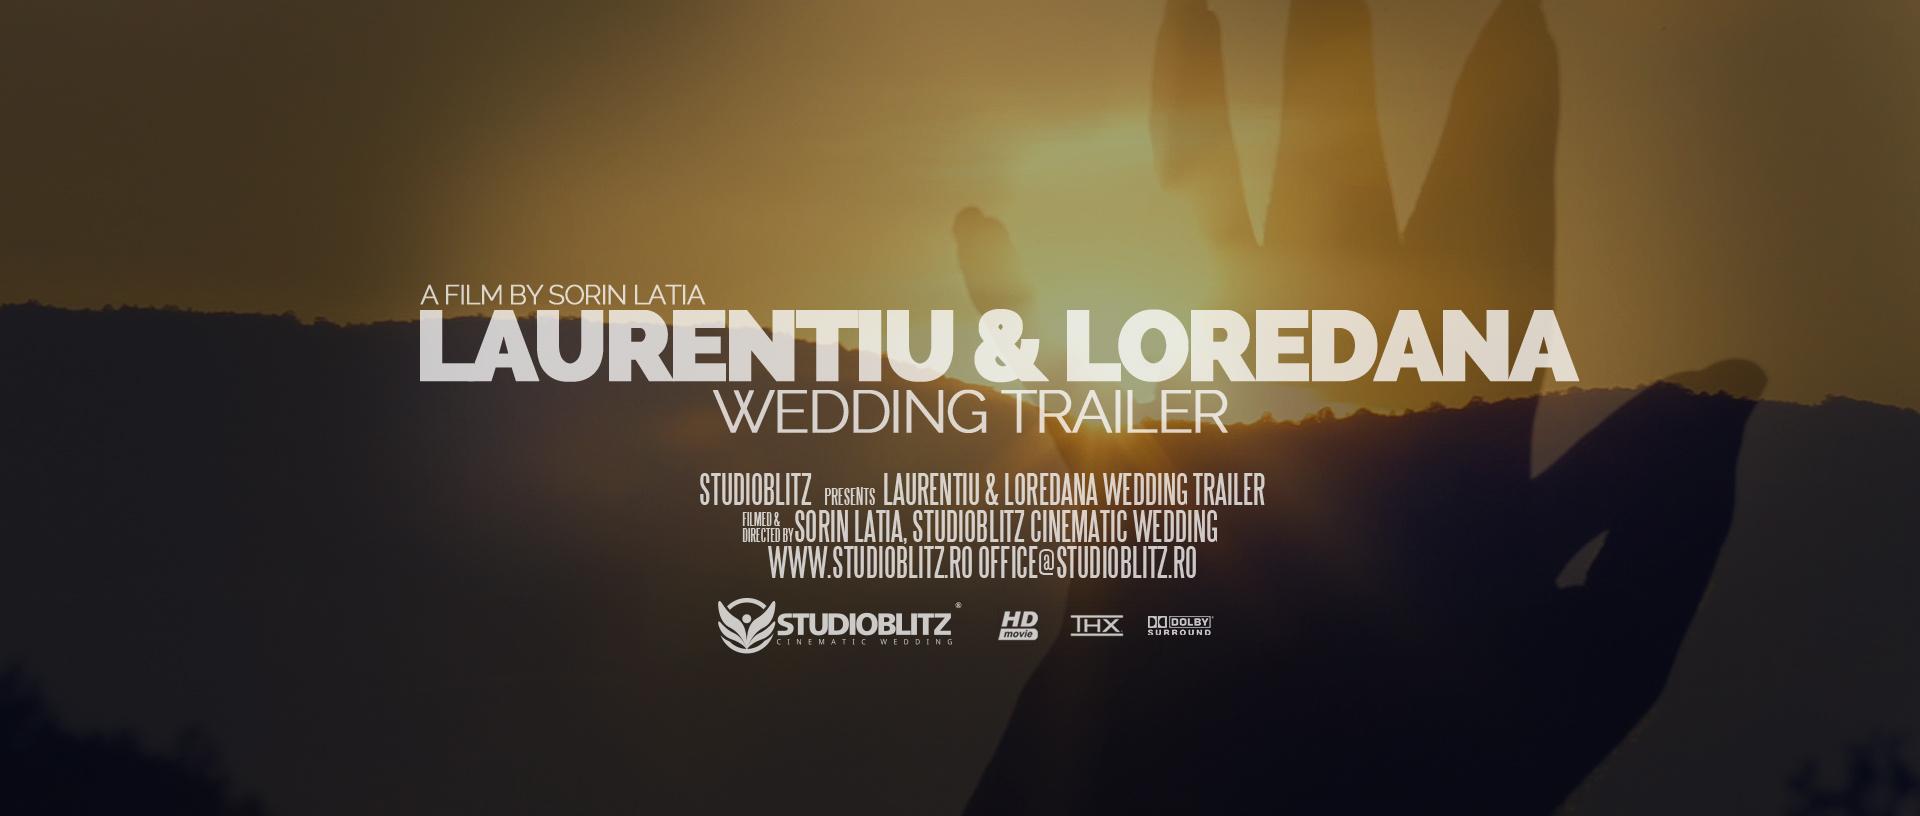 coperta-videograf-nunta-craiova-trailer-laurentiu-loredana